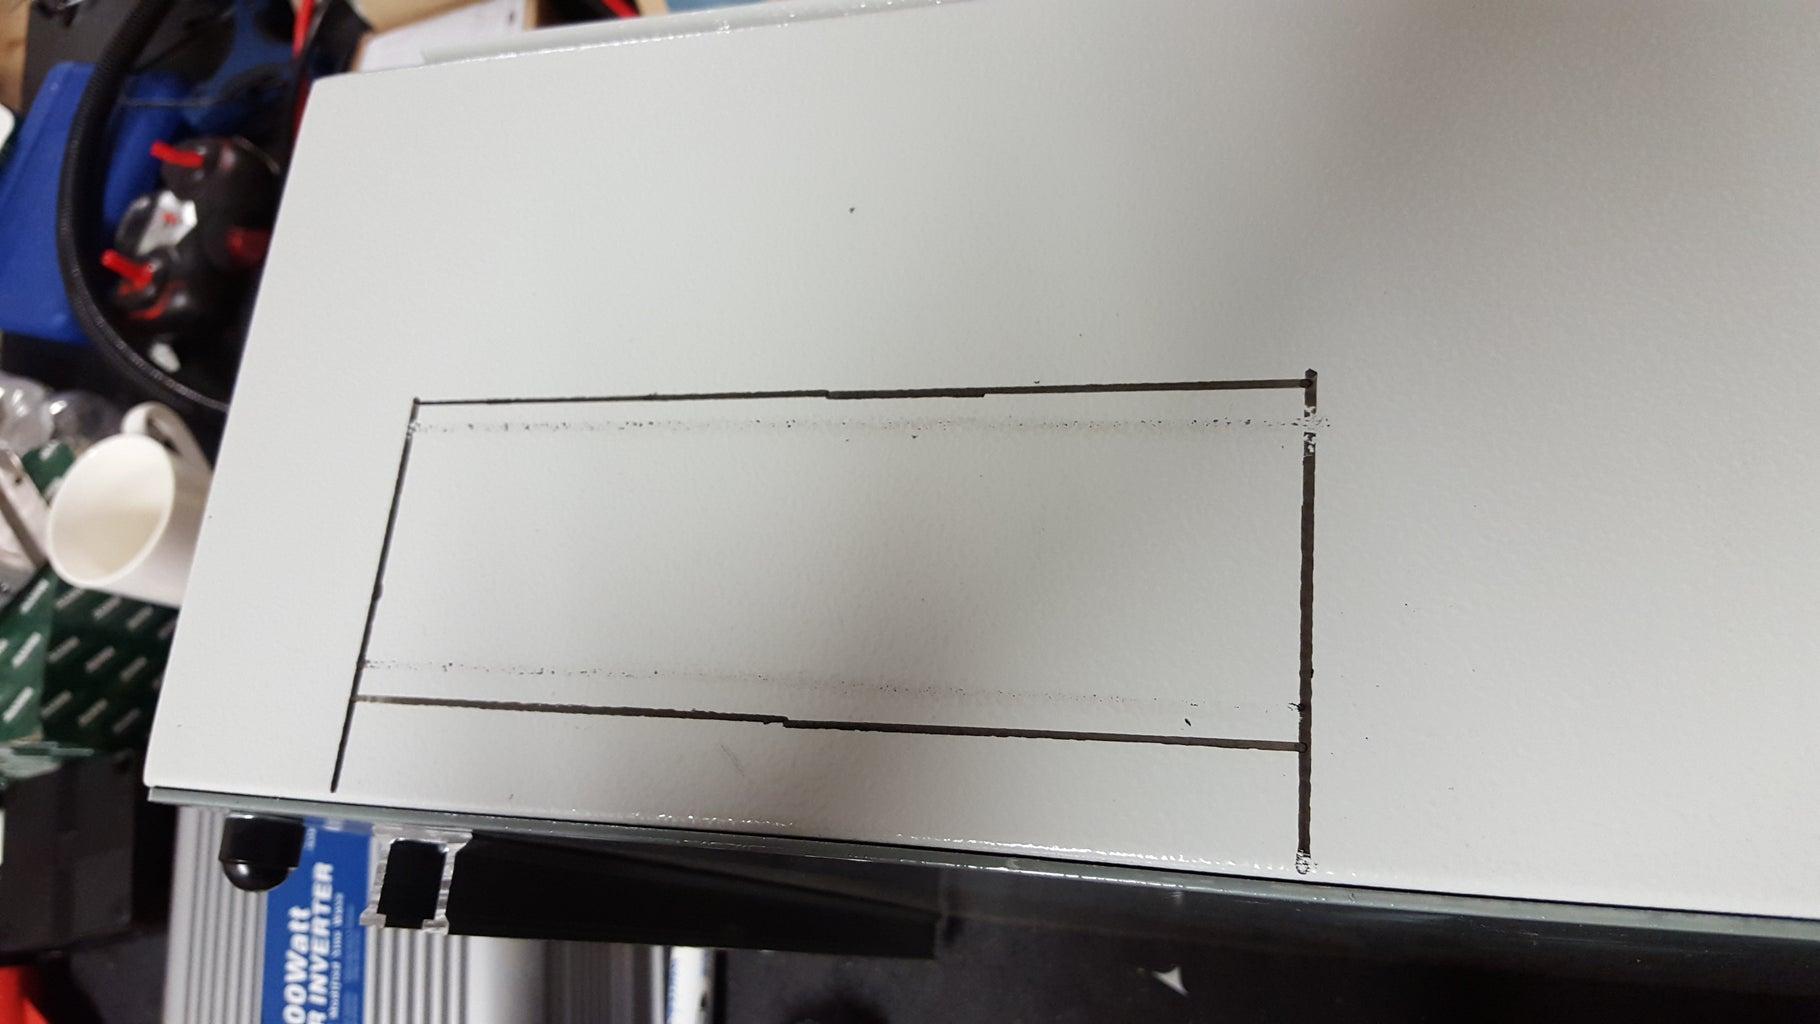 The Inverter